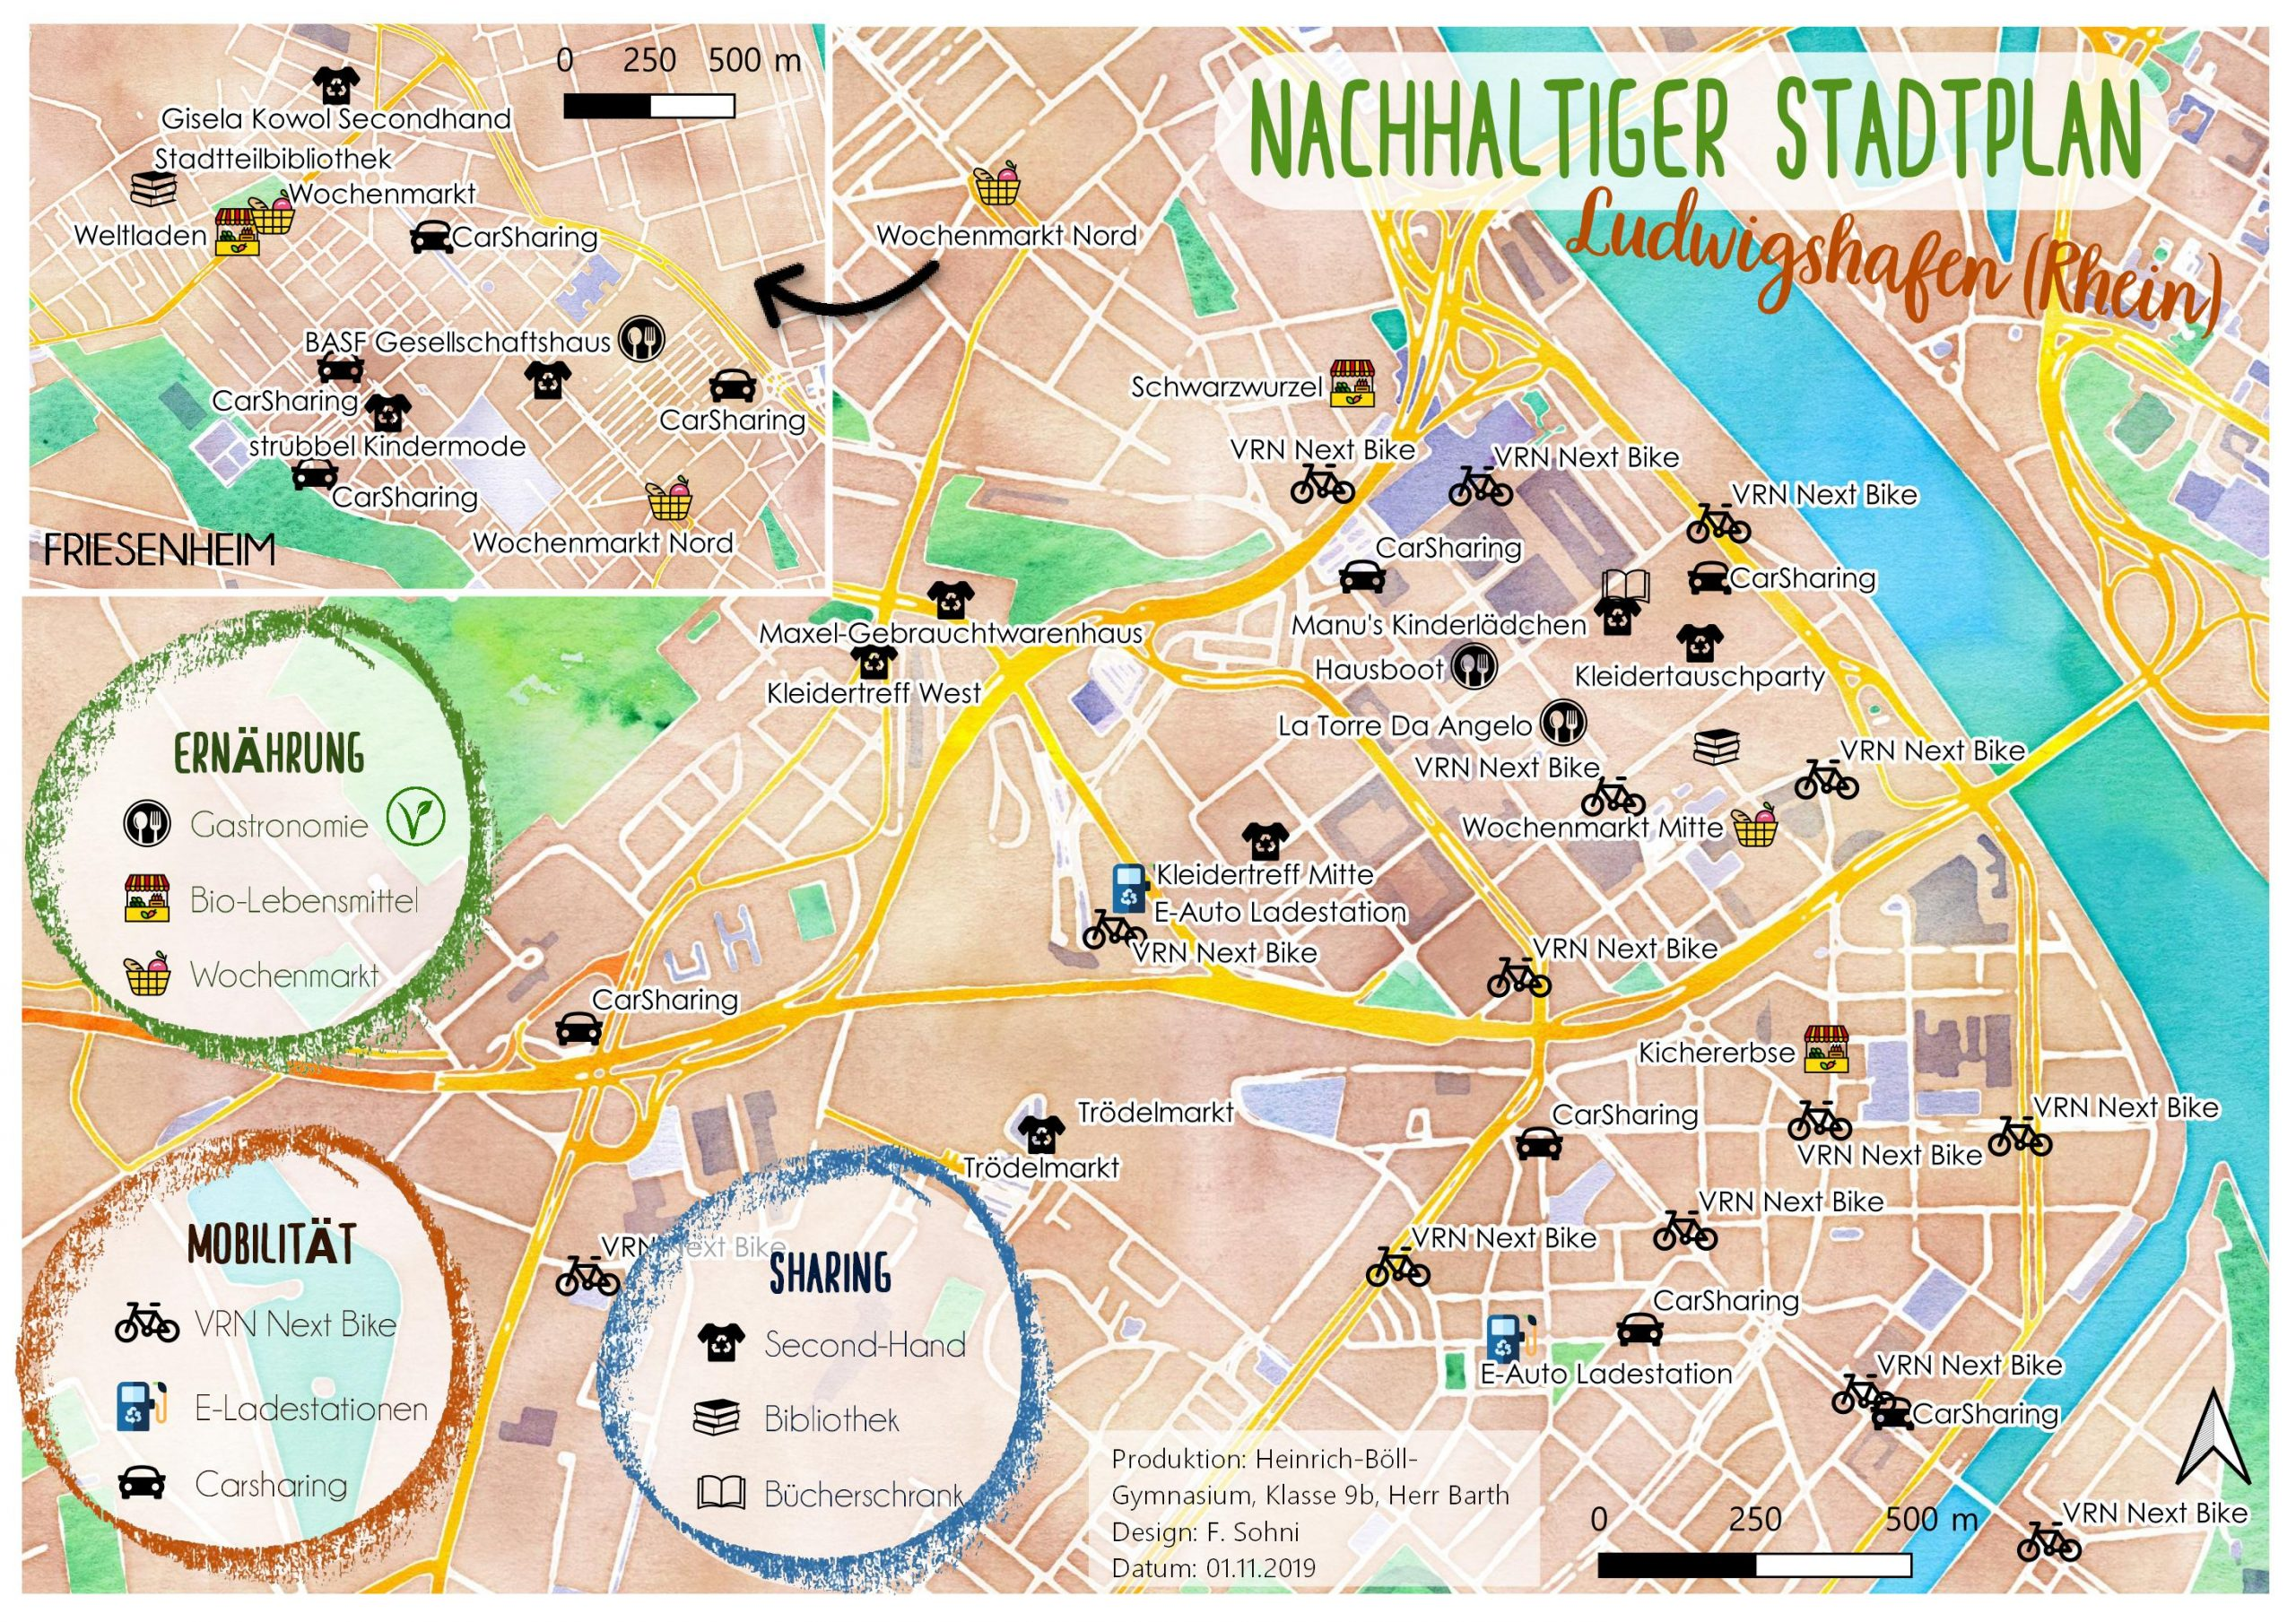 Nachhaltige Stadtkarte Ludwigshafen